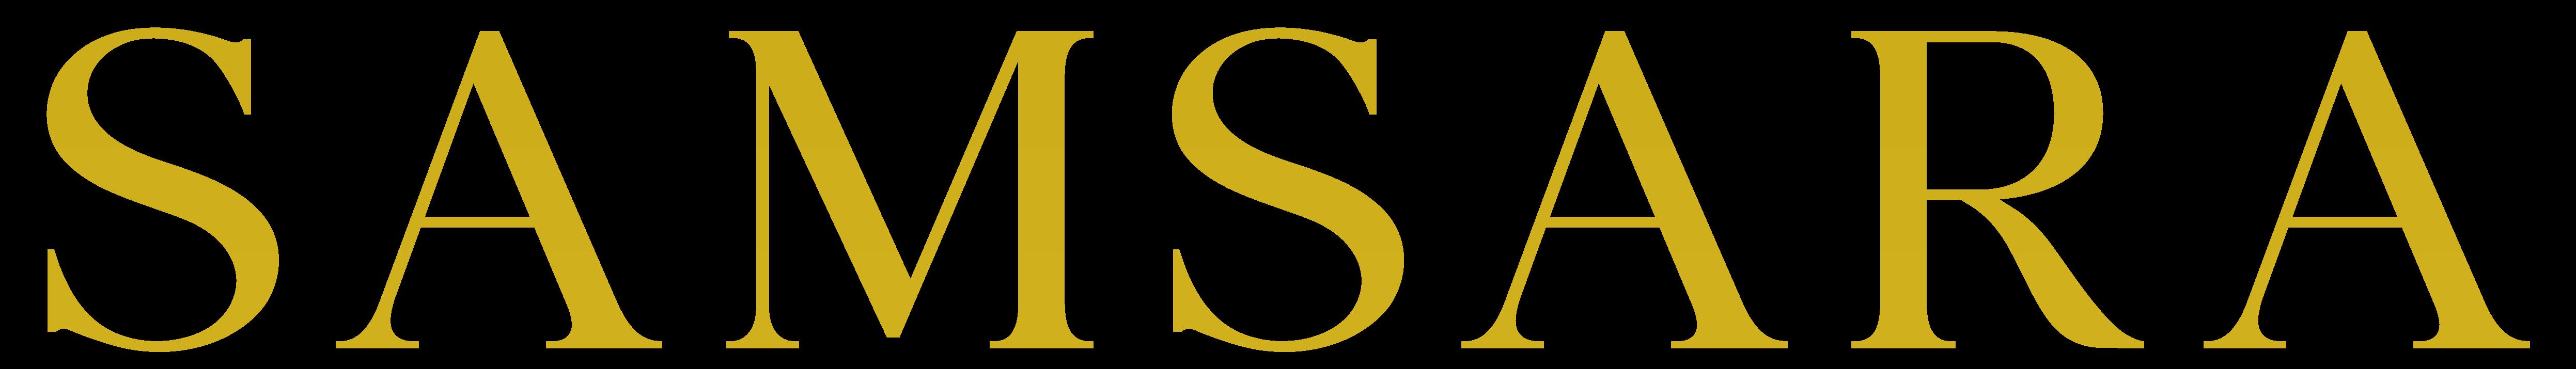 Samsara Couture